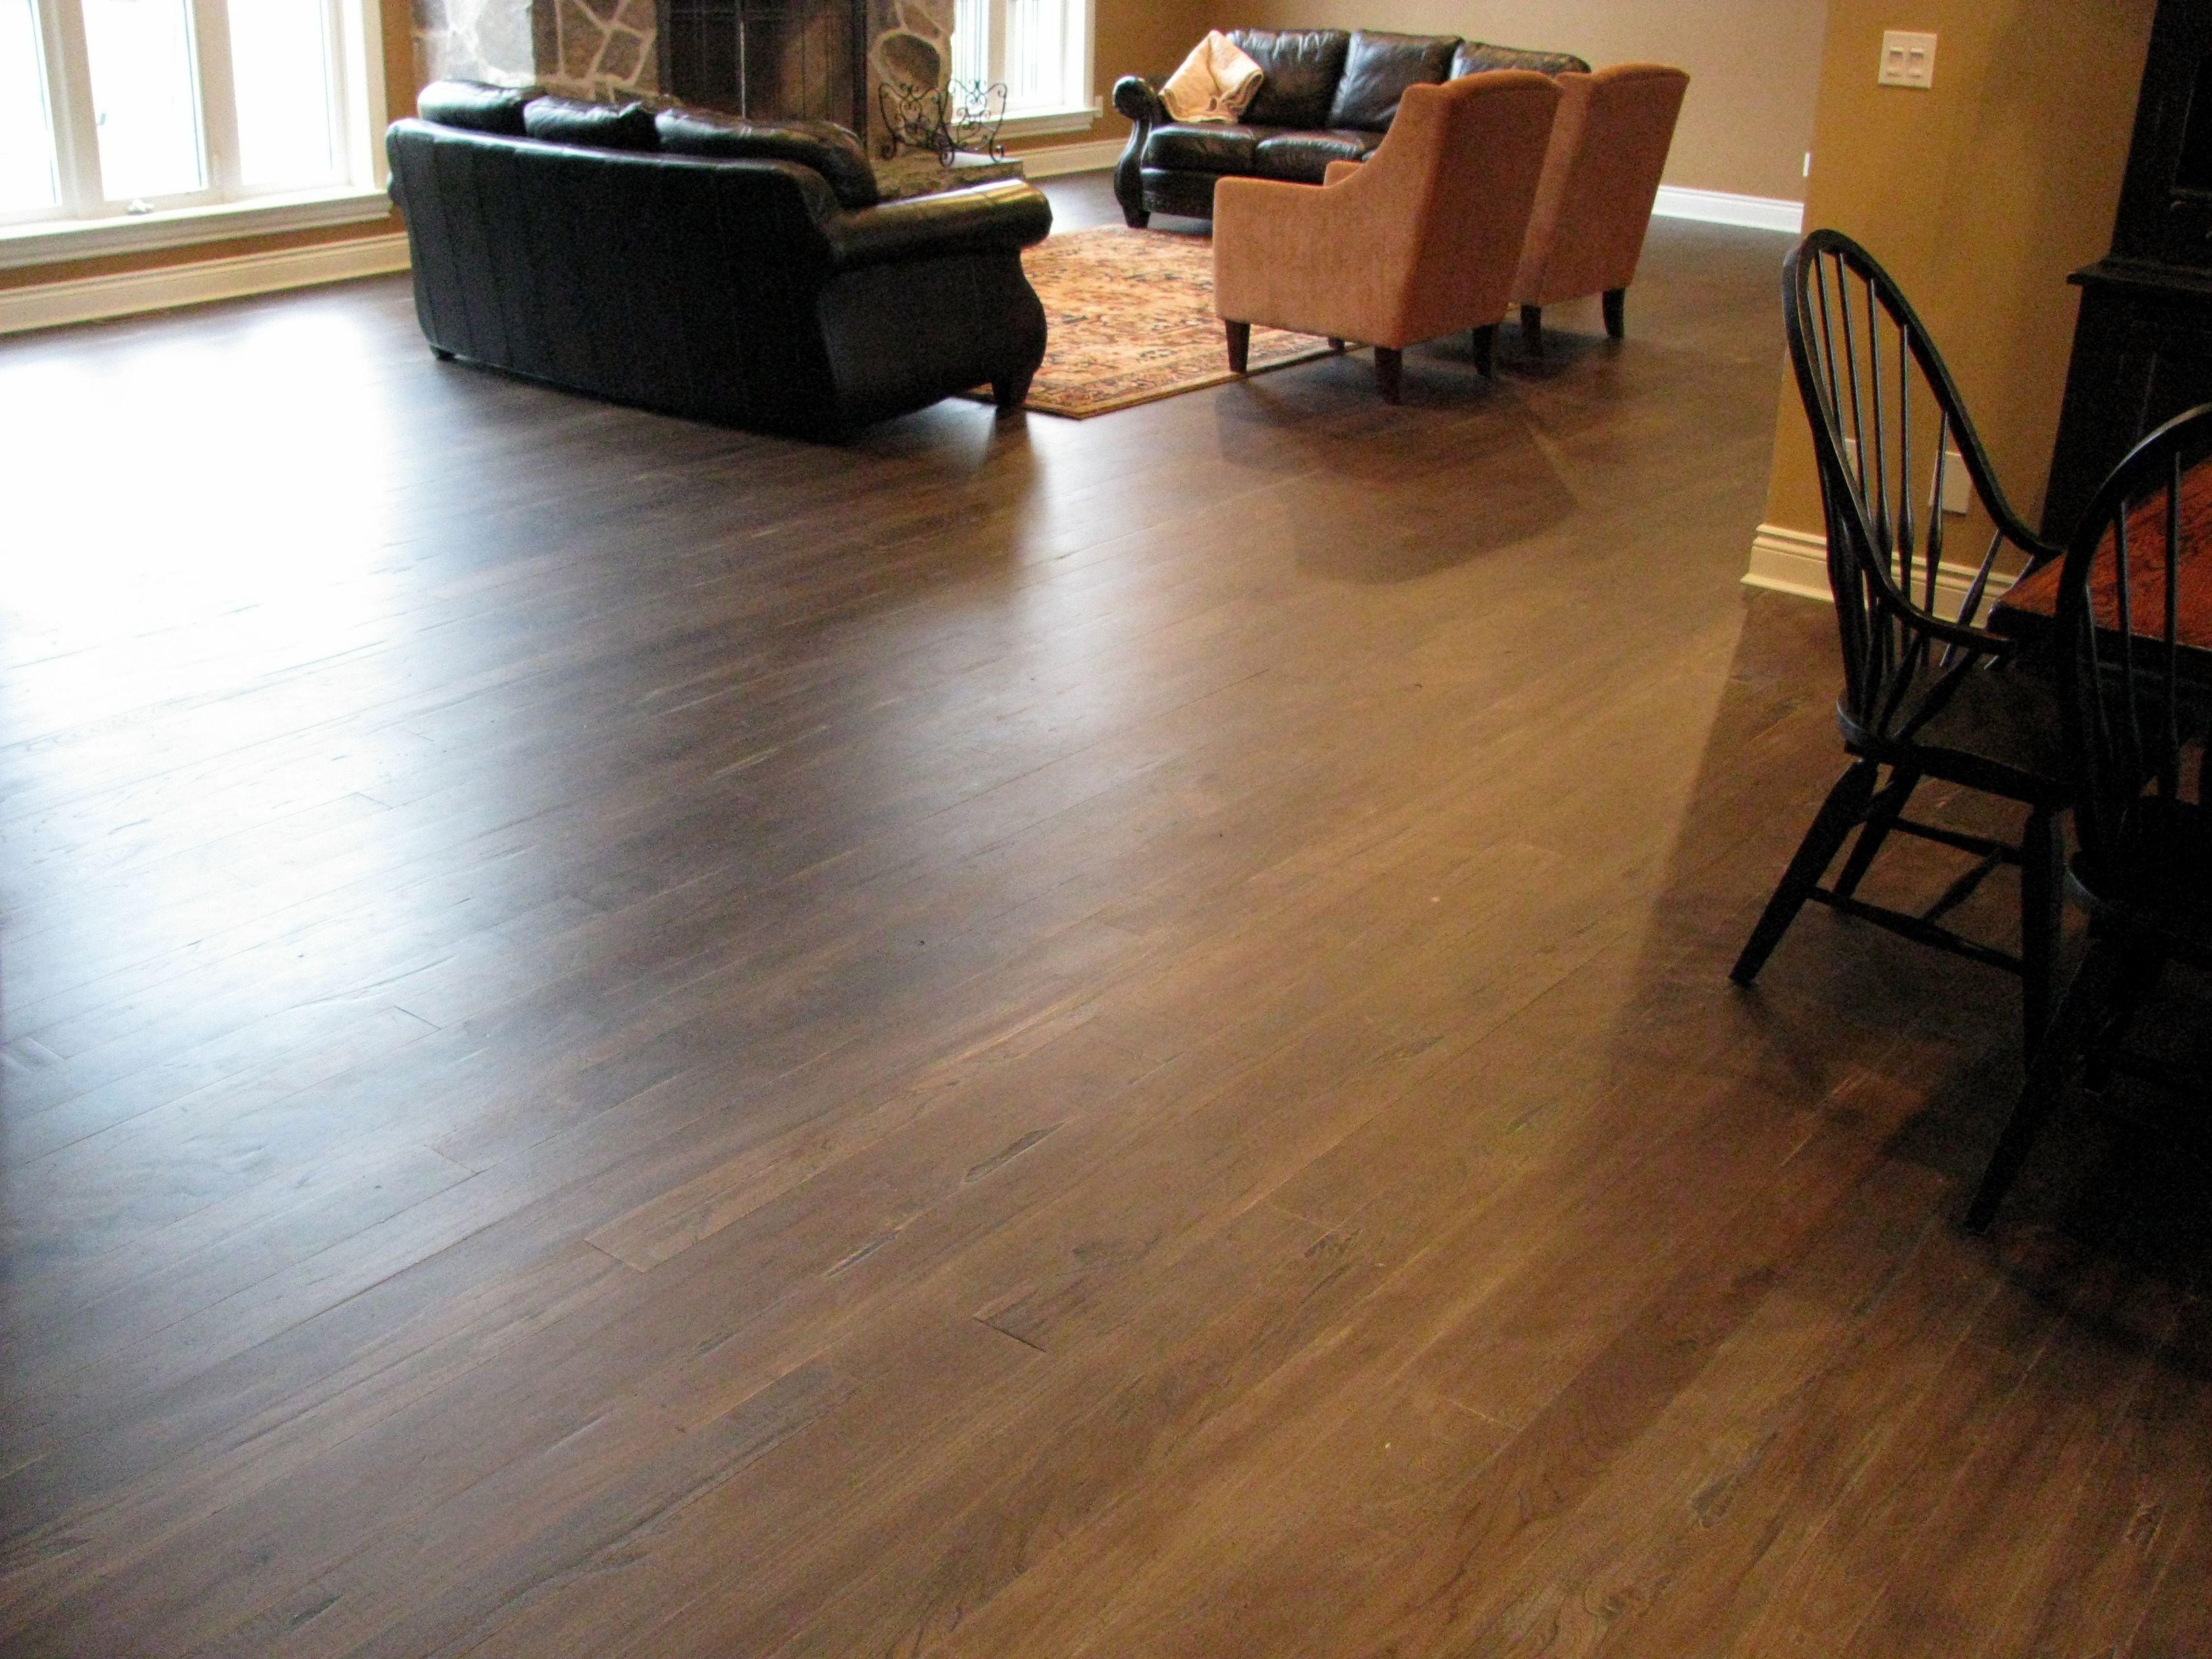 hardwood flooring barrie area of revival flooring revivalflooring on pinterest with regard to b9732dd27aebb459c1a95e15da4db140